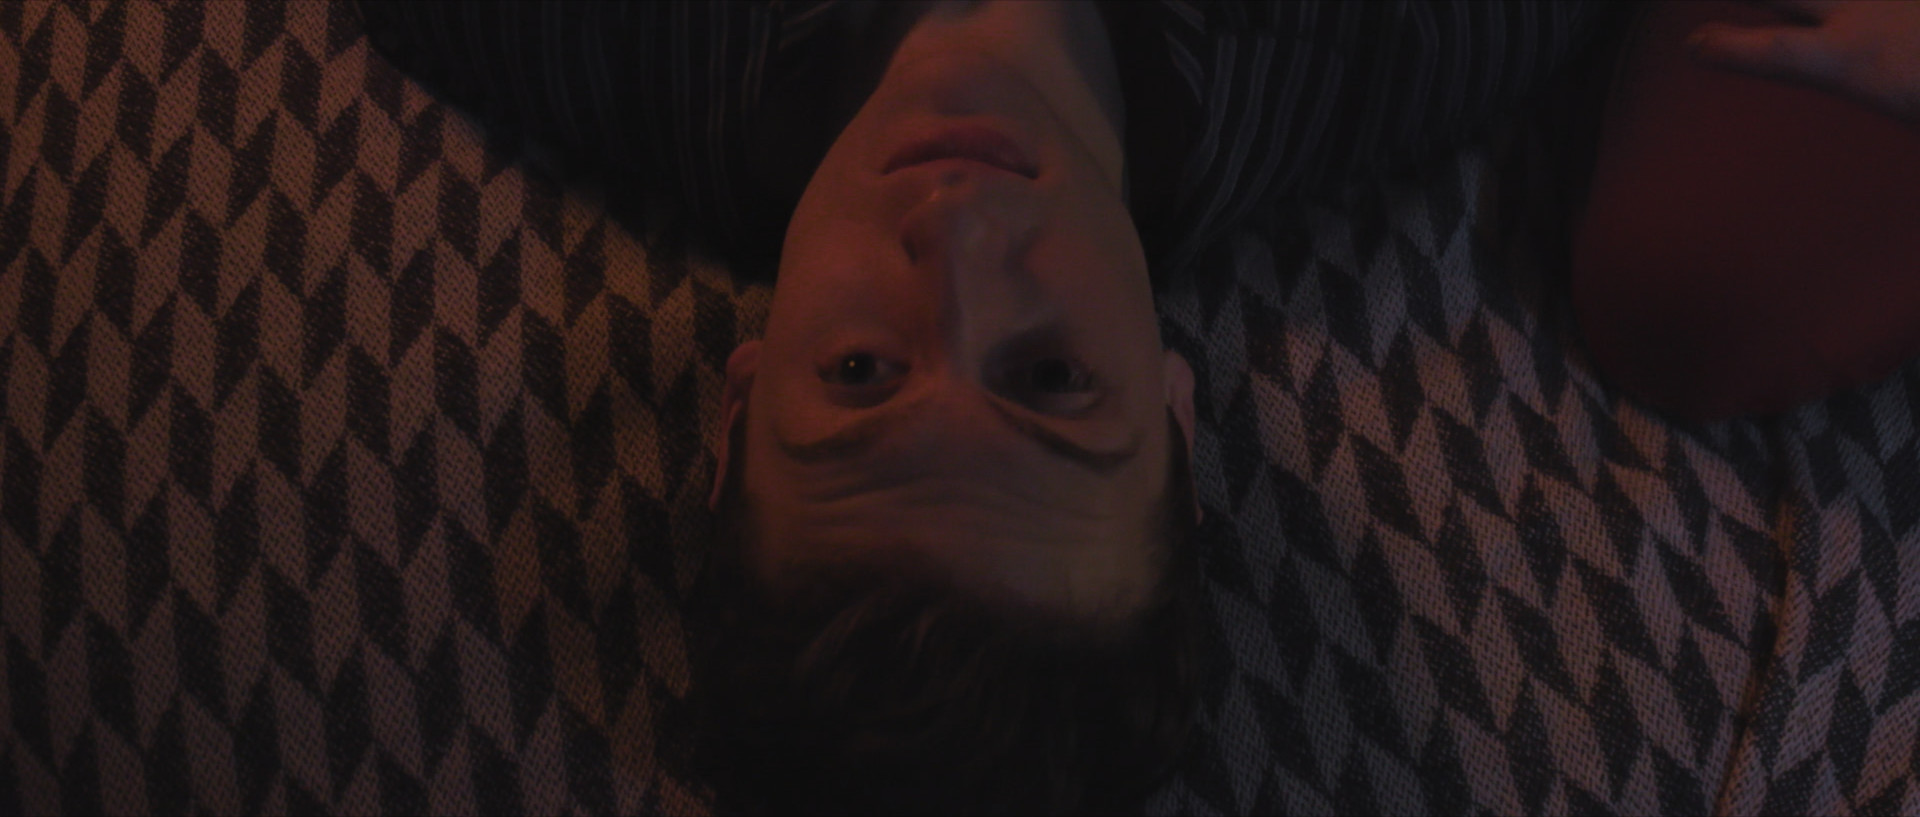 James Gulliford (Gary) in Sleep Tight